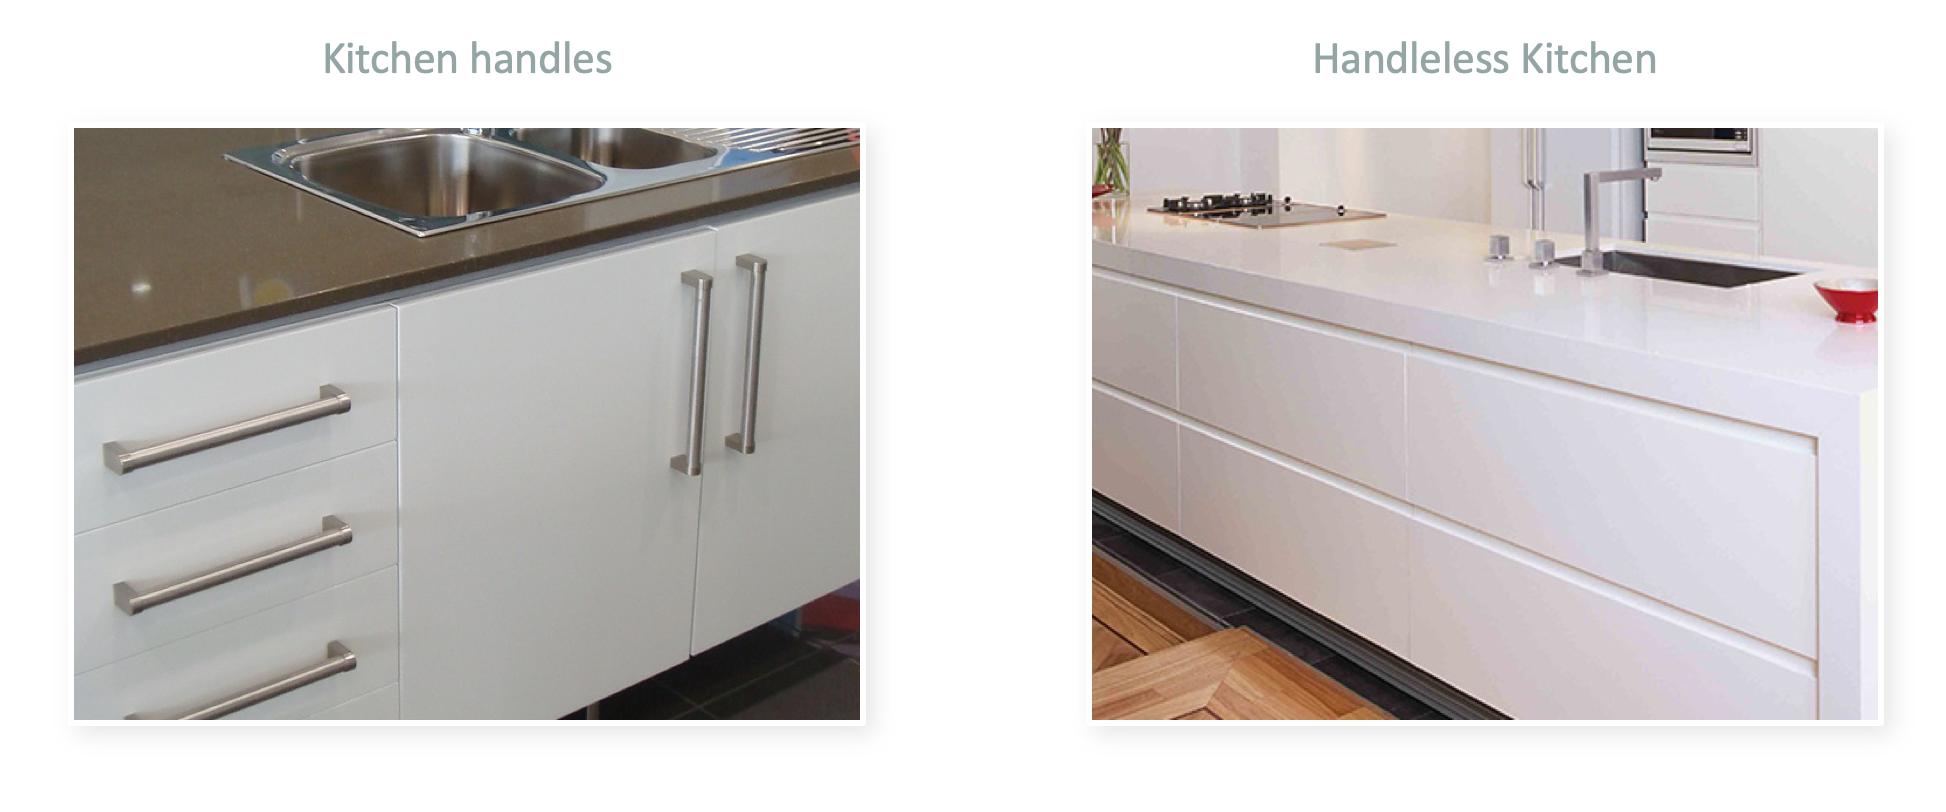 Usability vs. aesthetics - the kitchen version